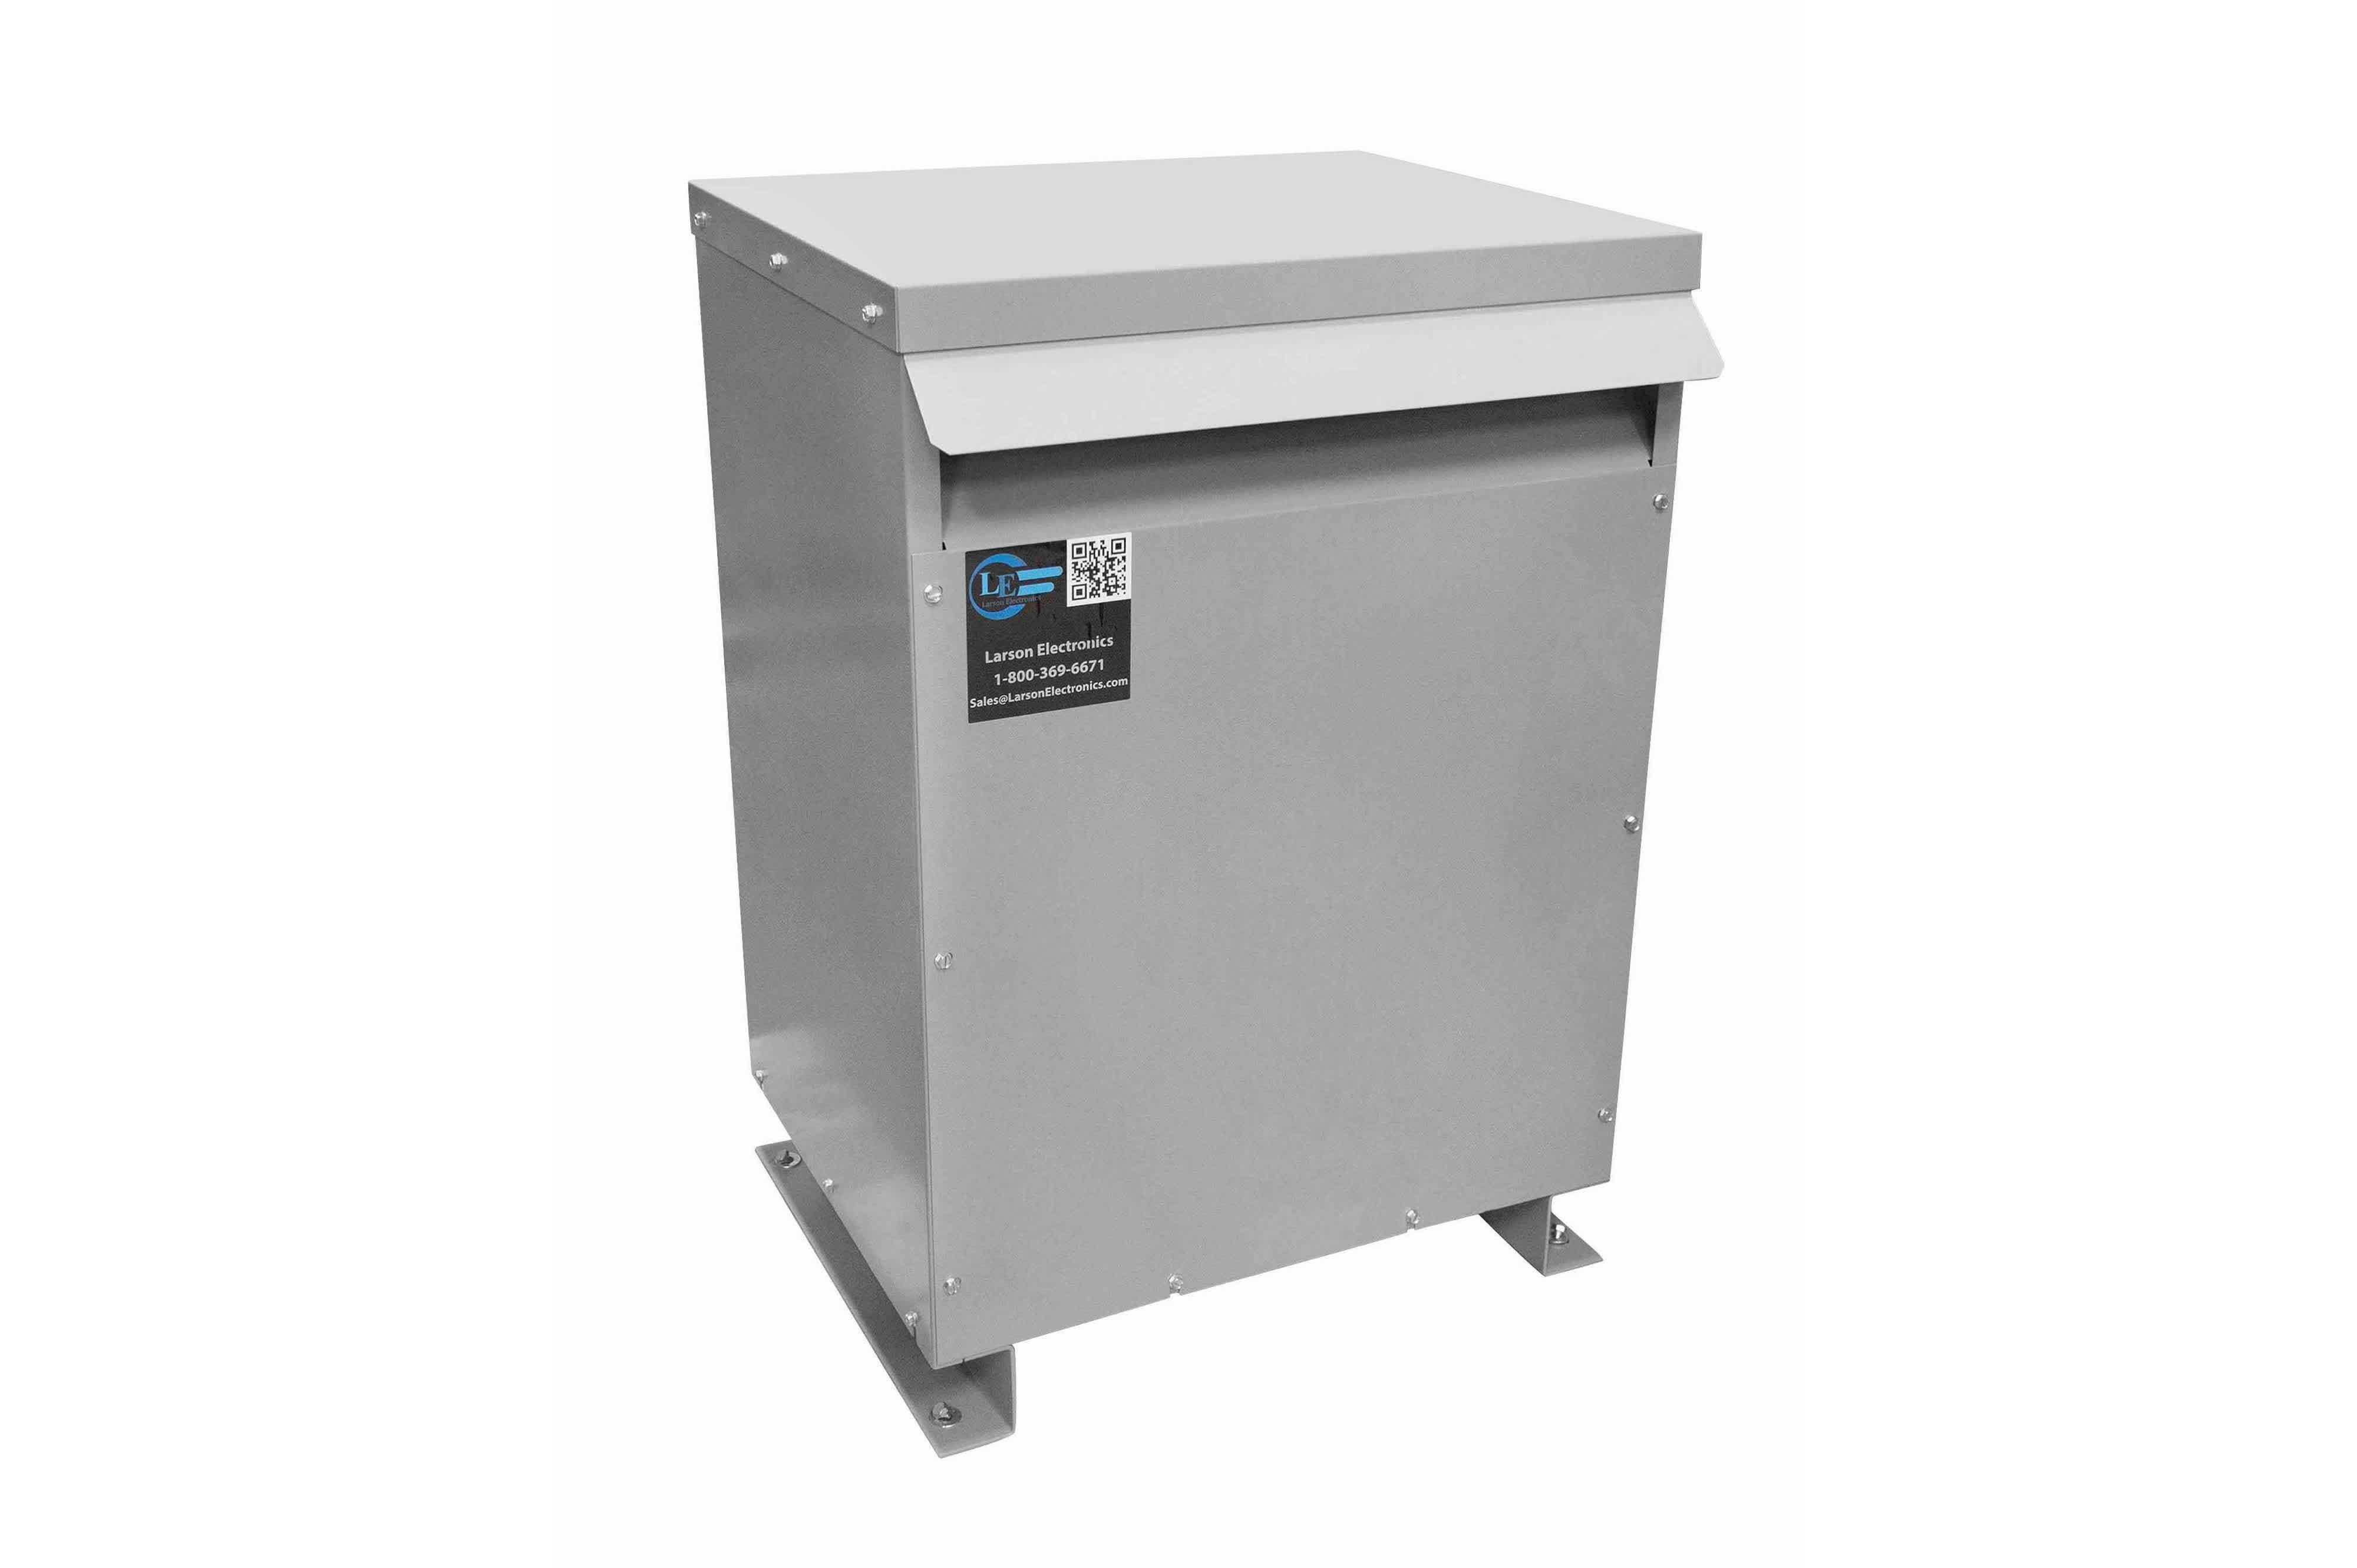 500 kVA 3PH Isolation Transformer, 208V Wye Primary, 400V Delta Secondary, N3R, Ventilated, 60 Hz